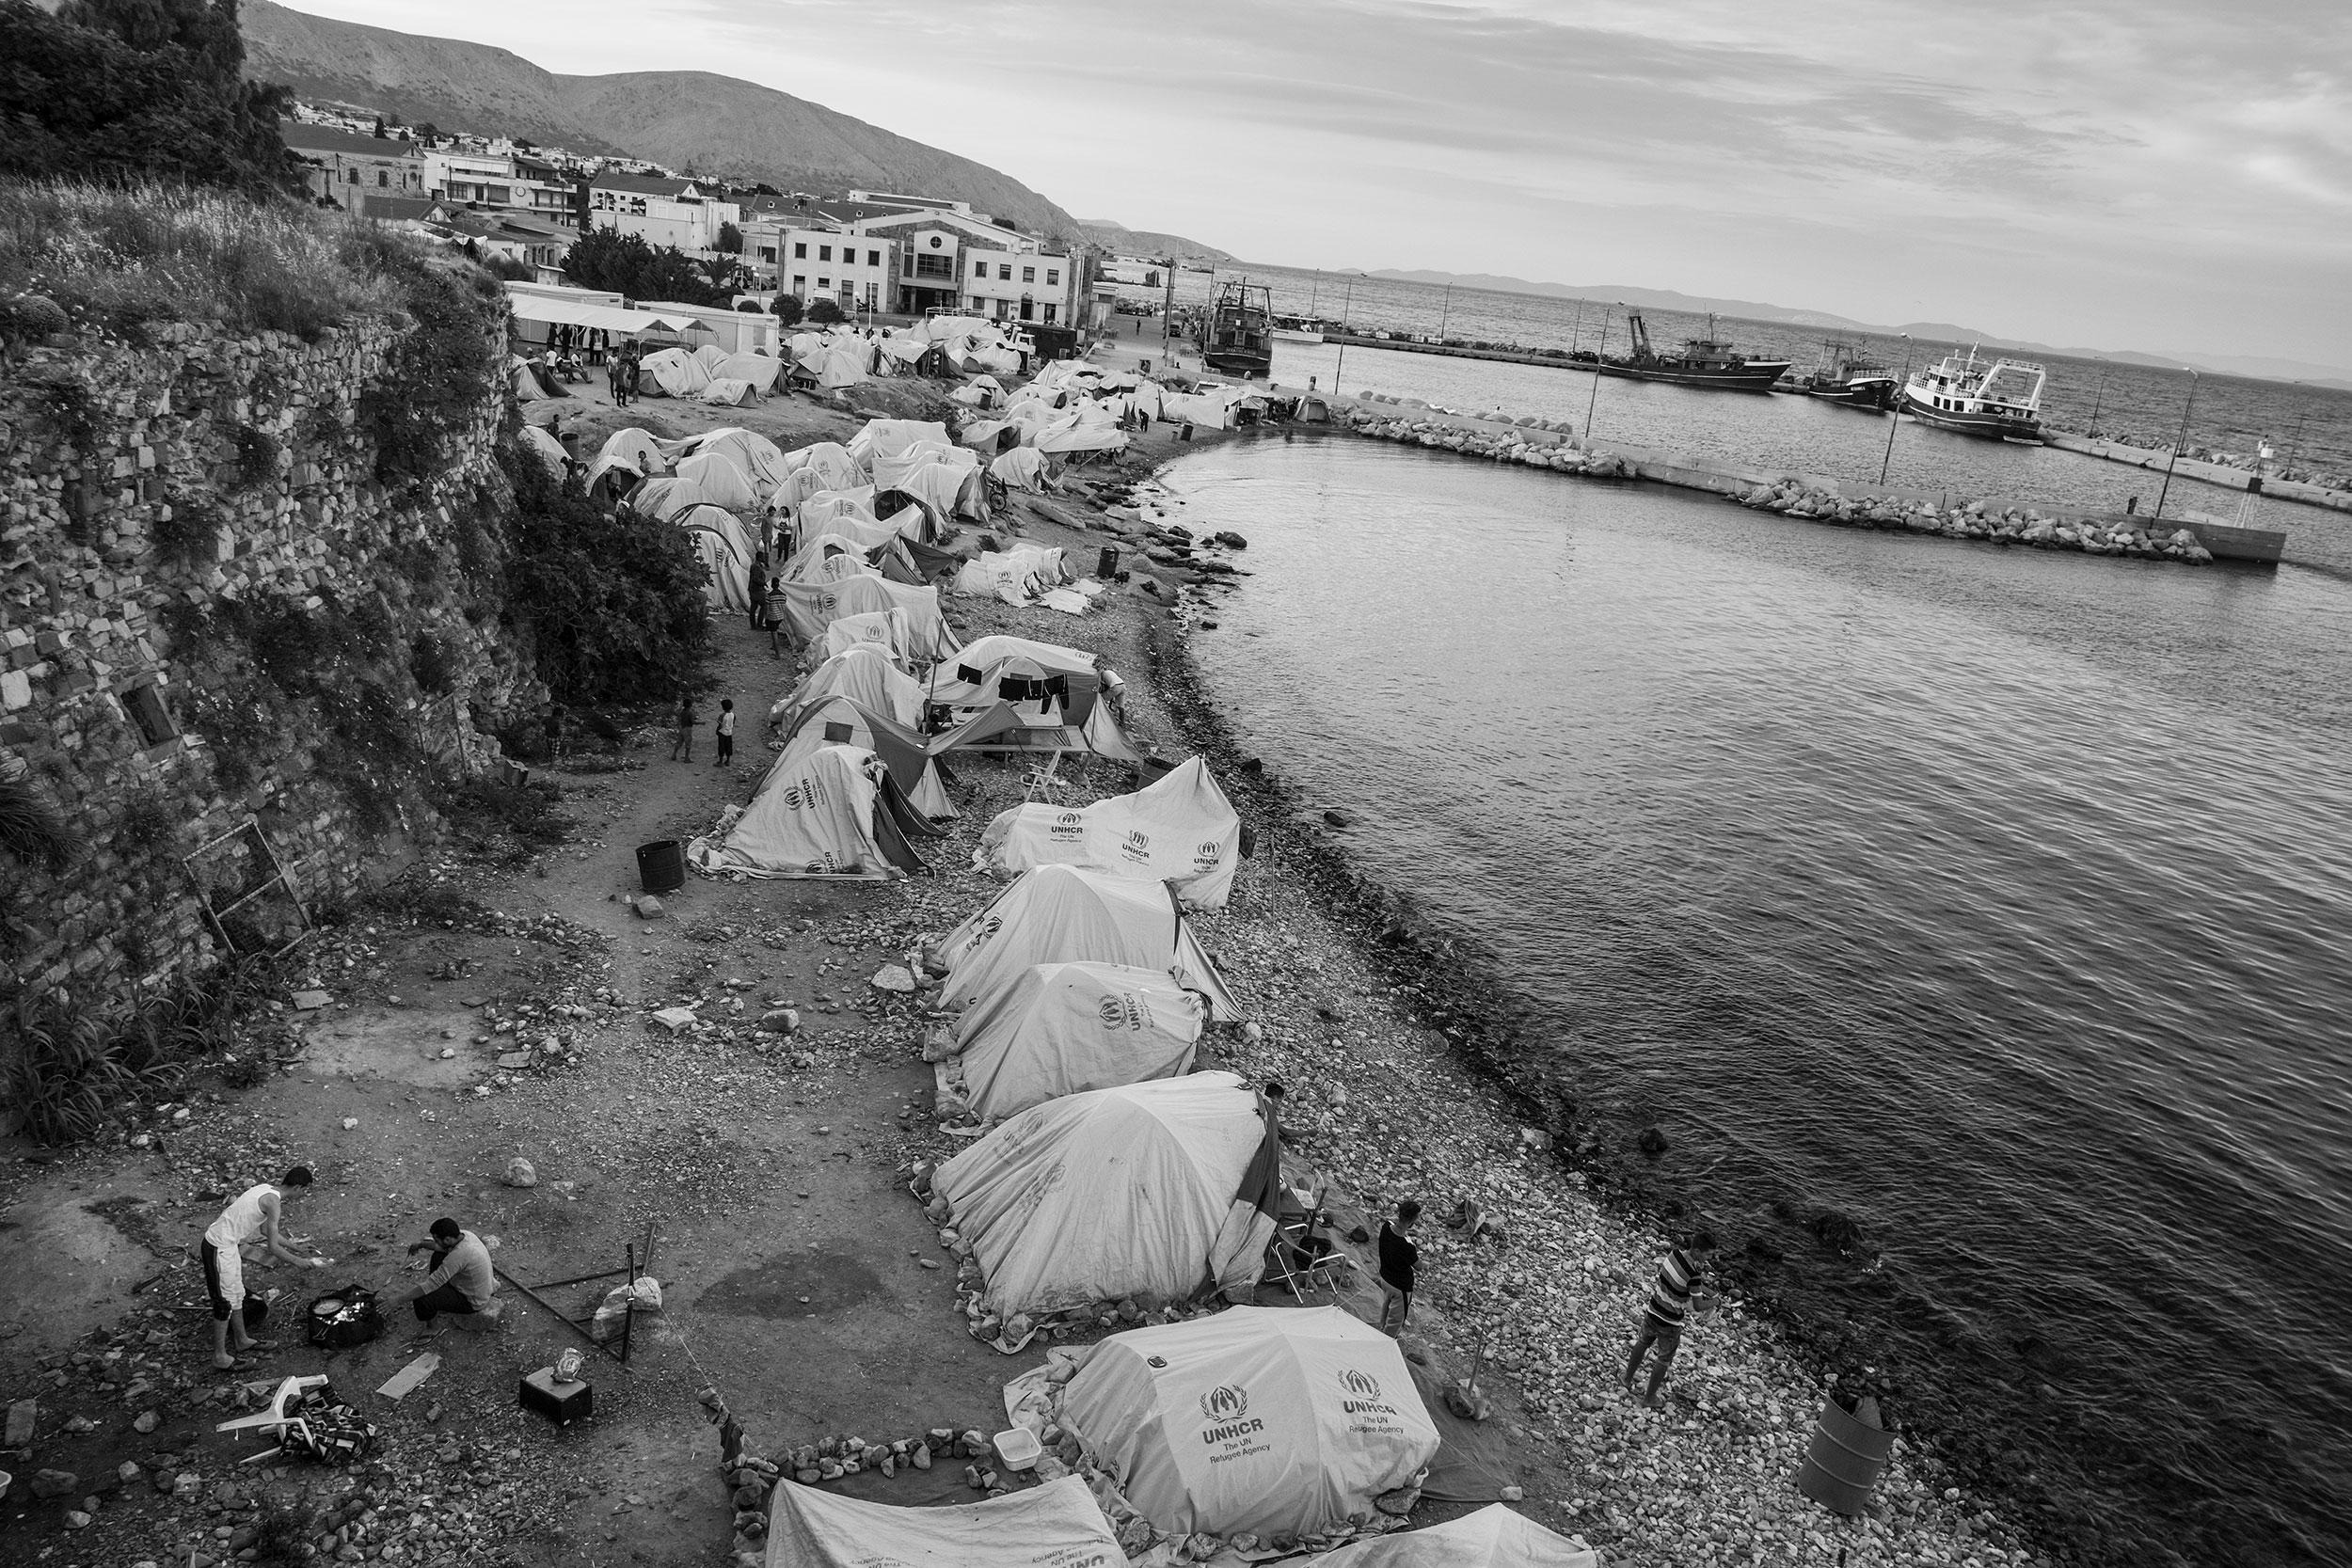 Greece, Chios